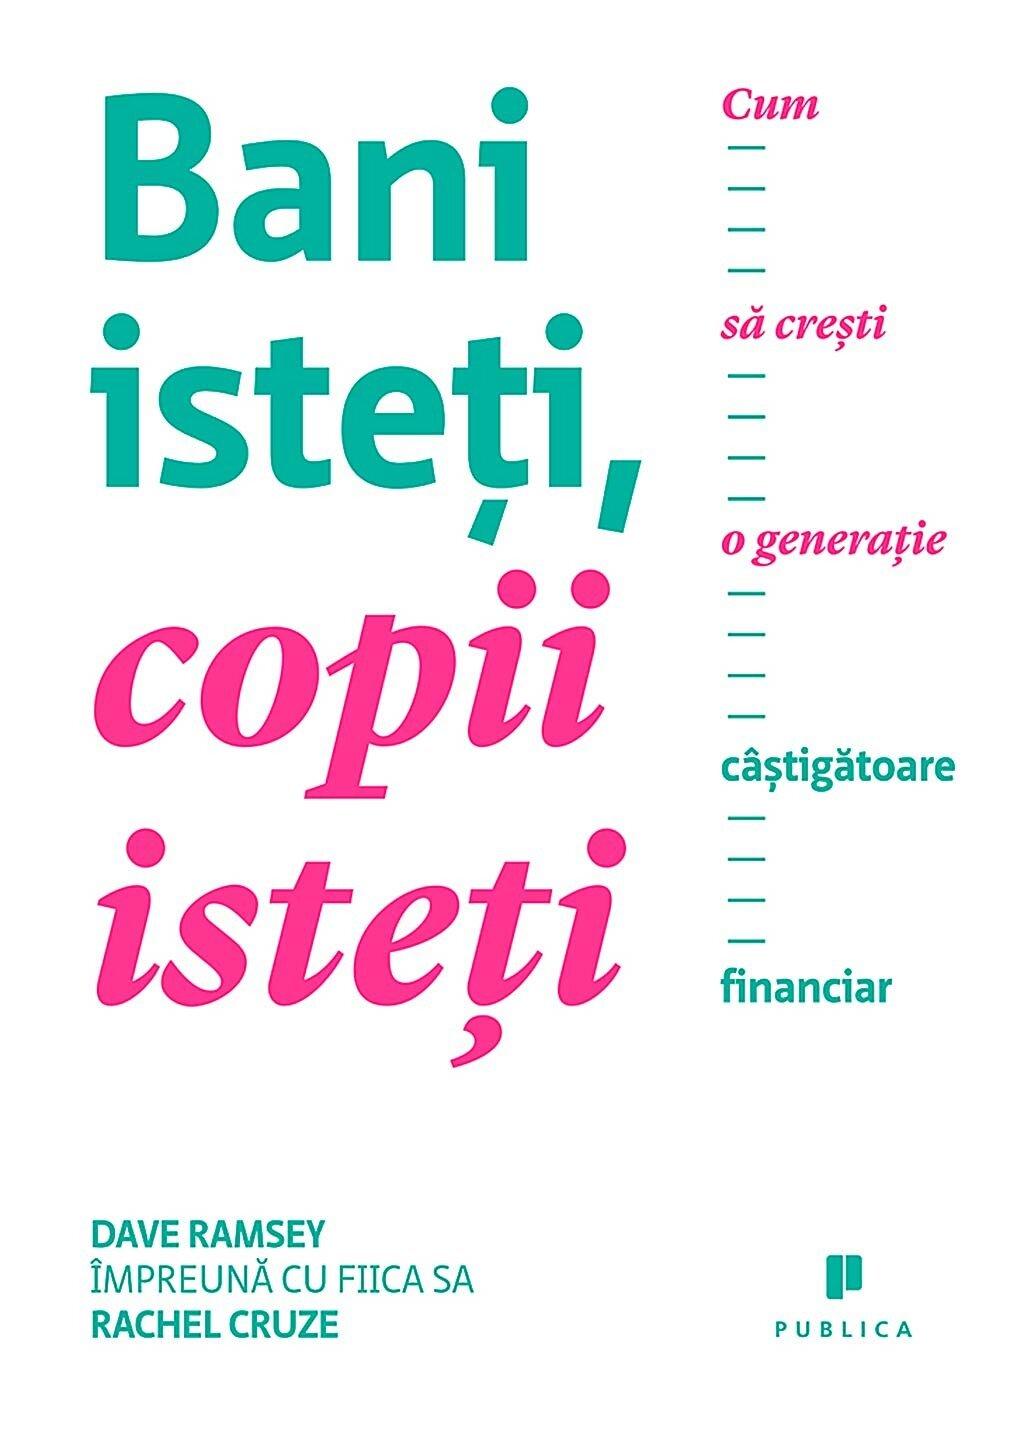 Bani isteti, copii isteti. Cum sa cresti o generatie castigatoare financiar PDF (Download eBook)